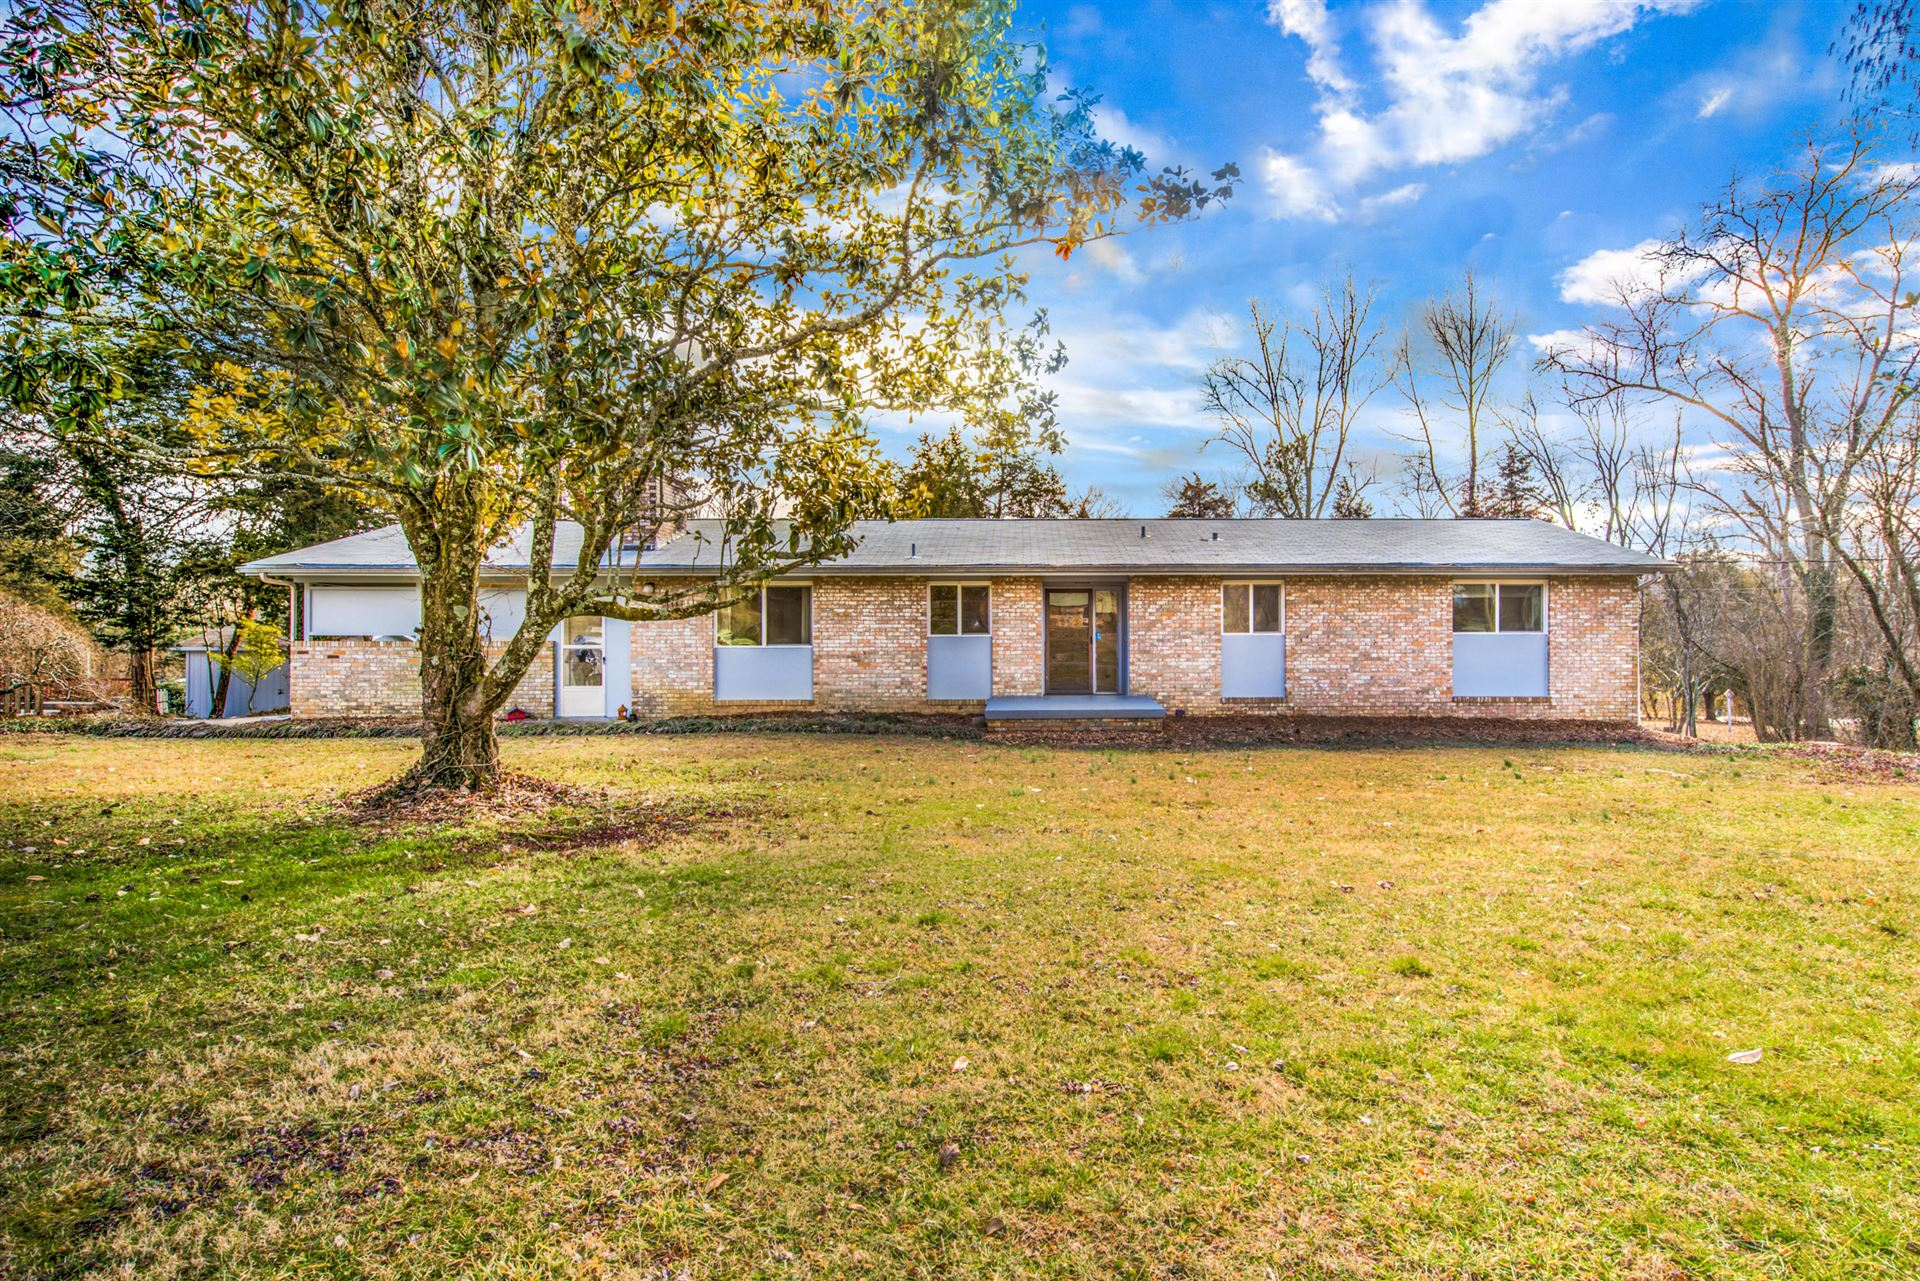 Photo of 111 Columbia Drive, Oak Ridge, TN 37830 (MLS # 1143539)